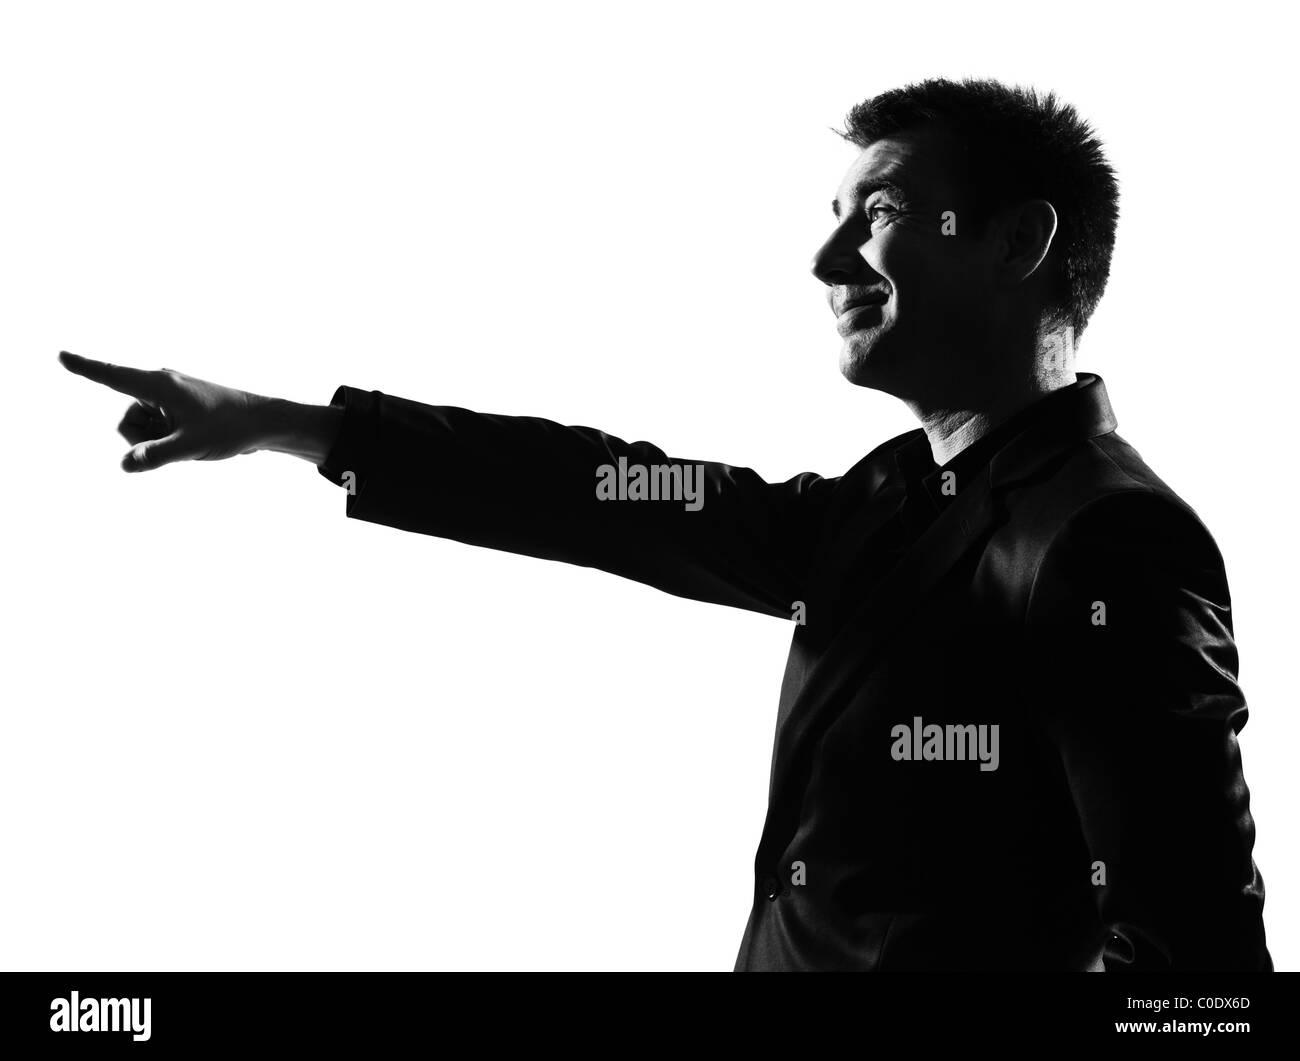 silhouette caucasian business man expressing pointing mocking sneering behavior full length on studio isolated white - Stock Image